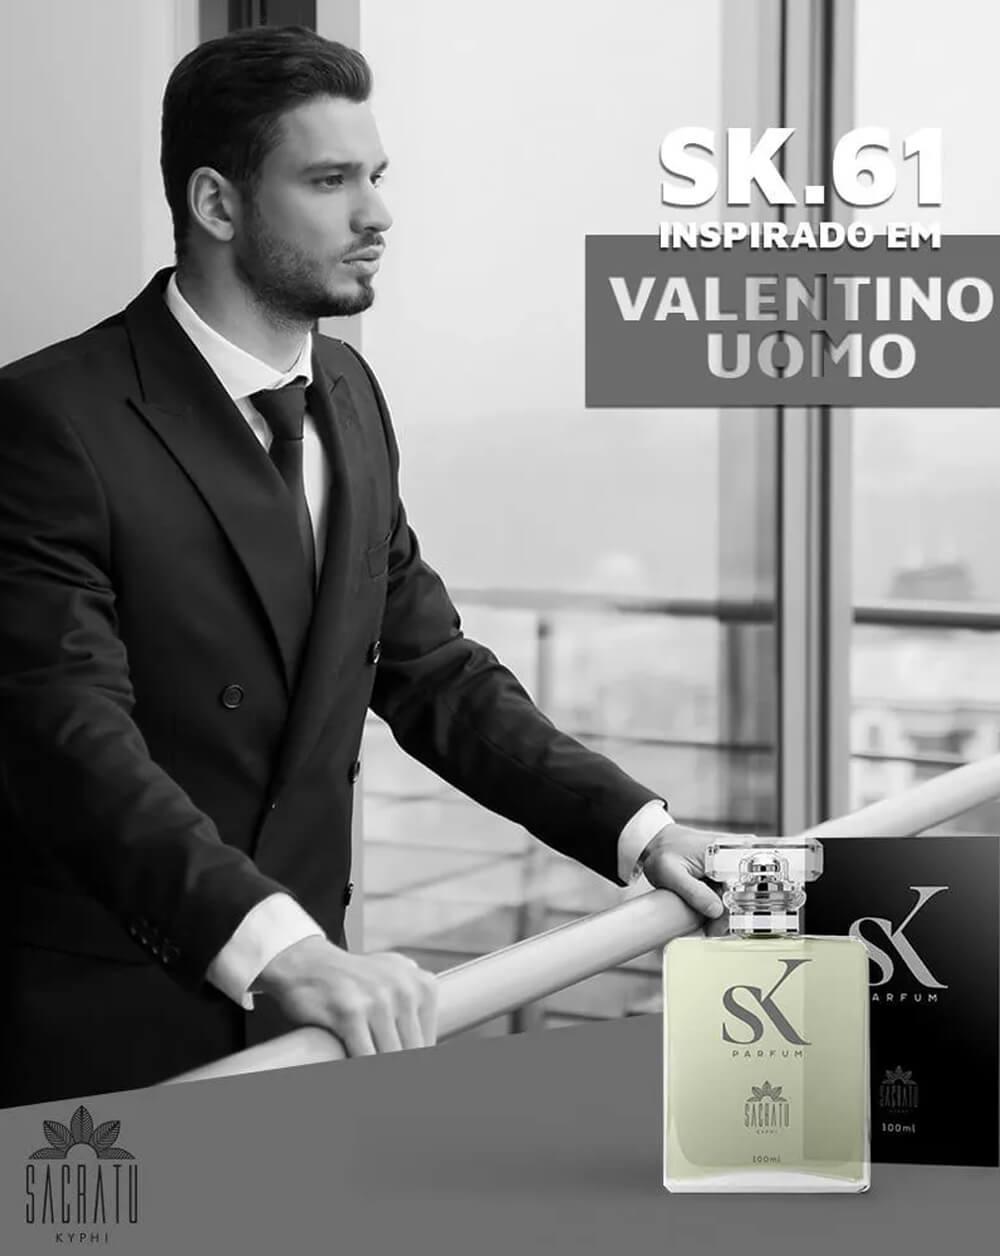 SK 61 Inspirado no Valentino Uomo by Valentino